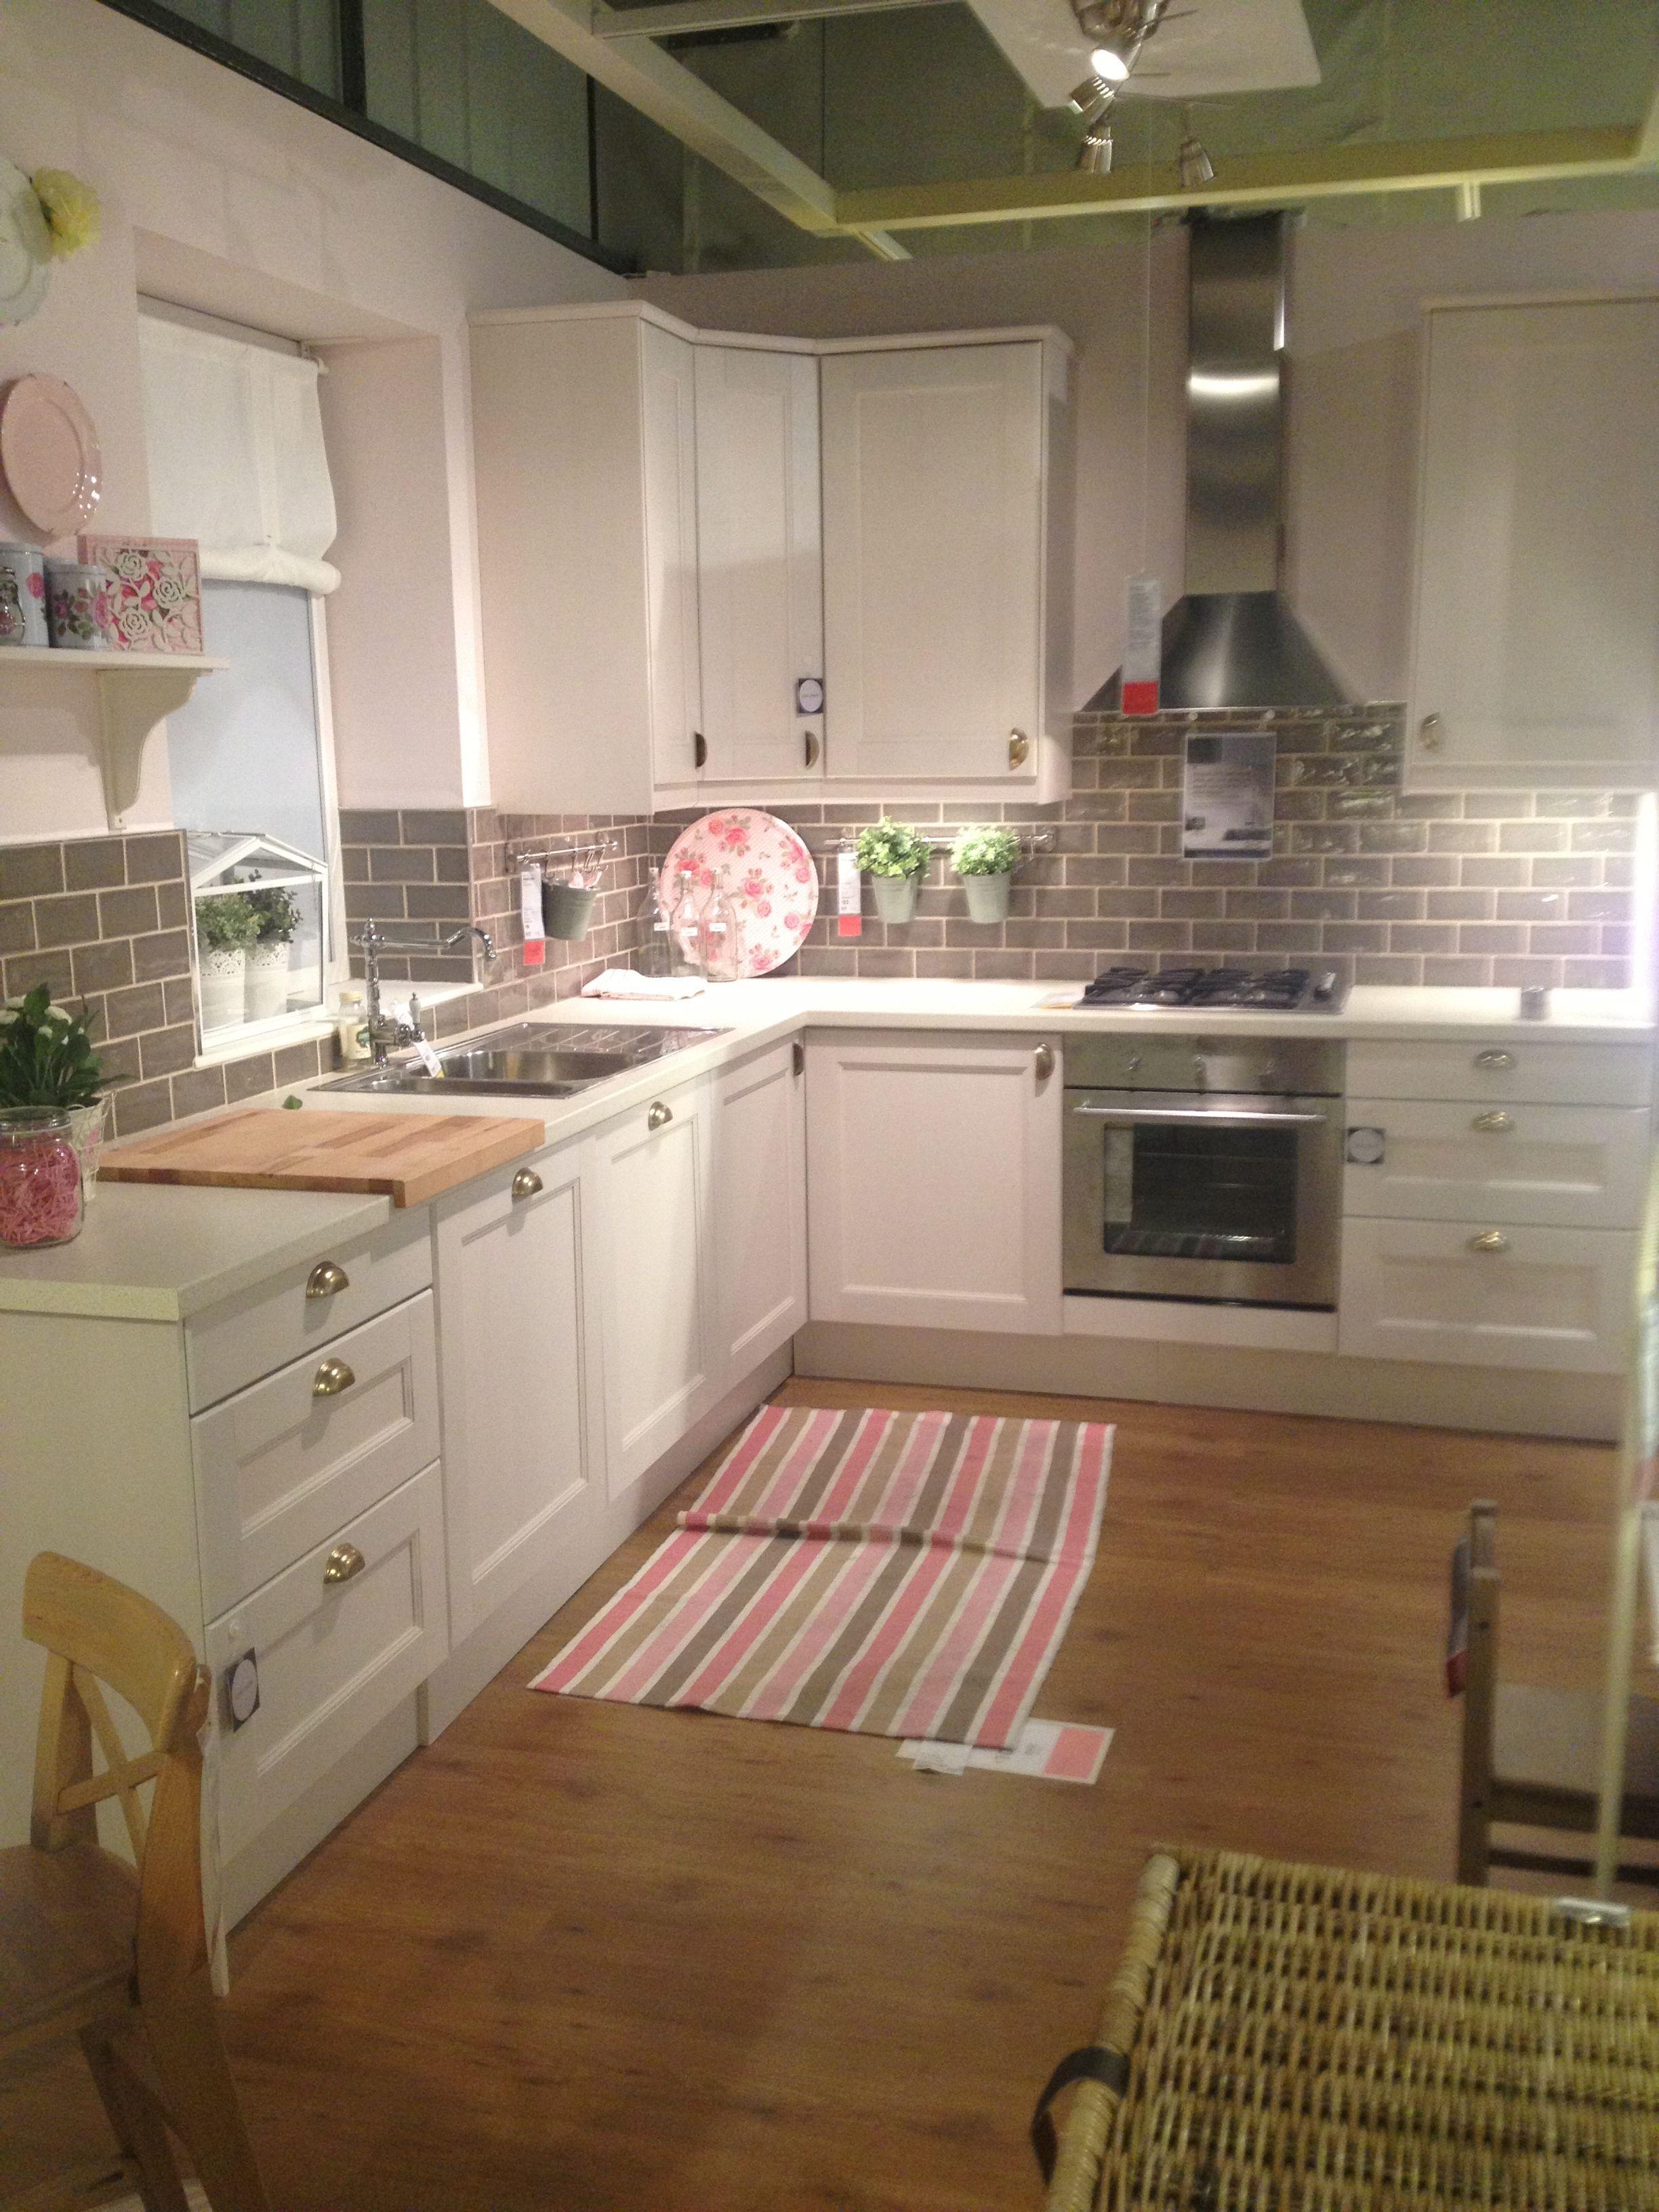 Also included some broken ceramic roses found in. Ikea Kitchen Cucina Ikea Cucine Arredamento